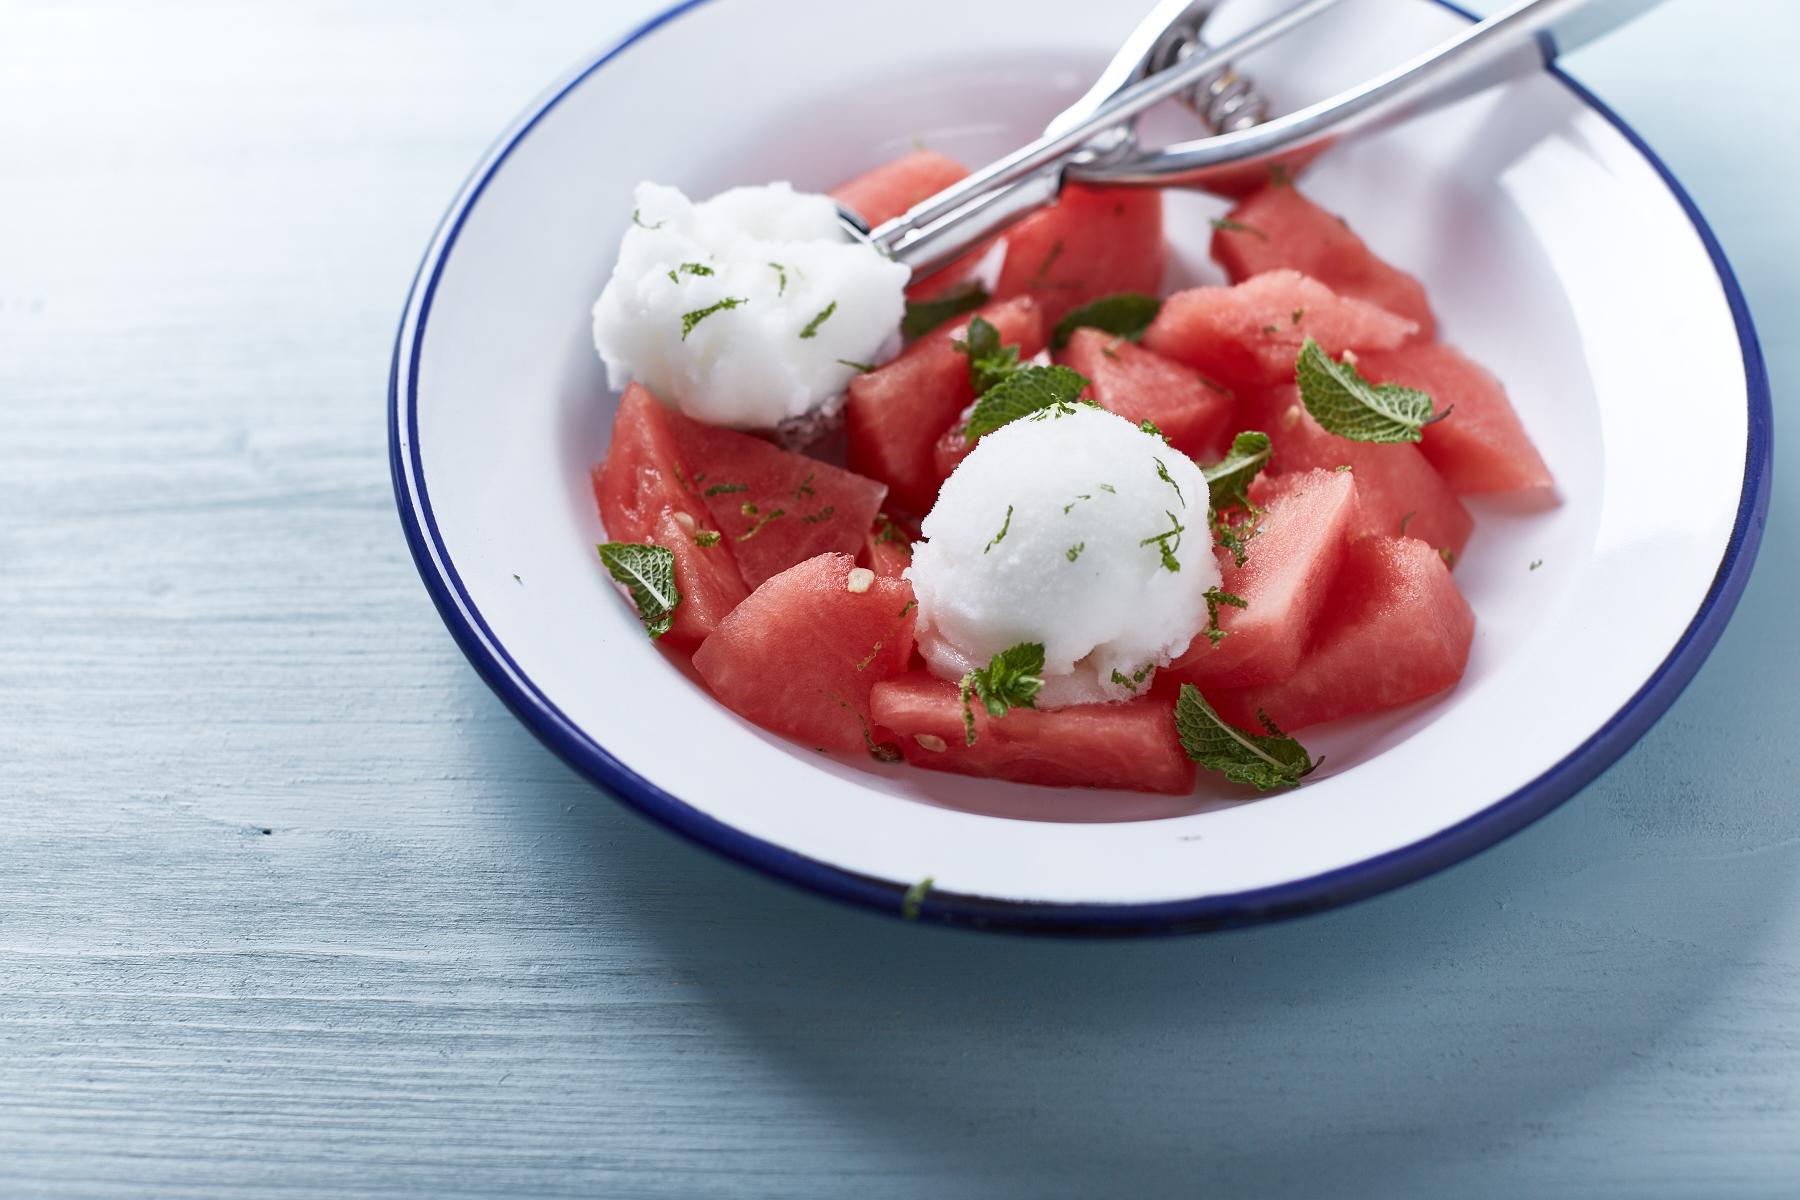 WassermelonenSorbe 1